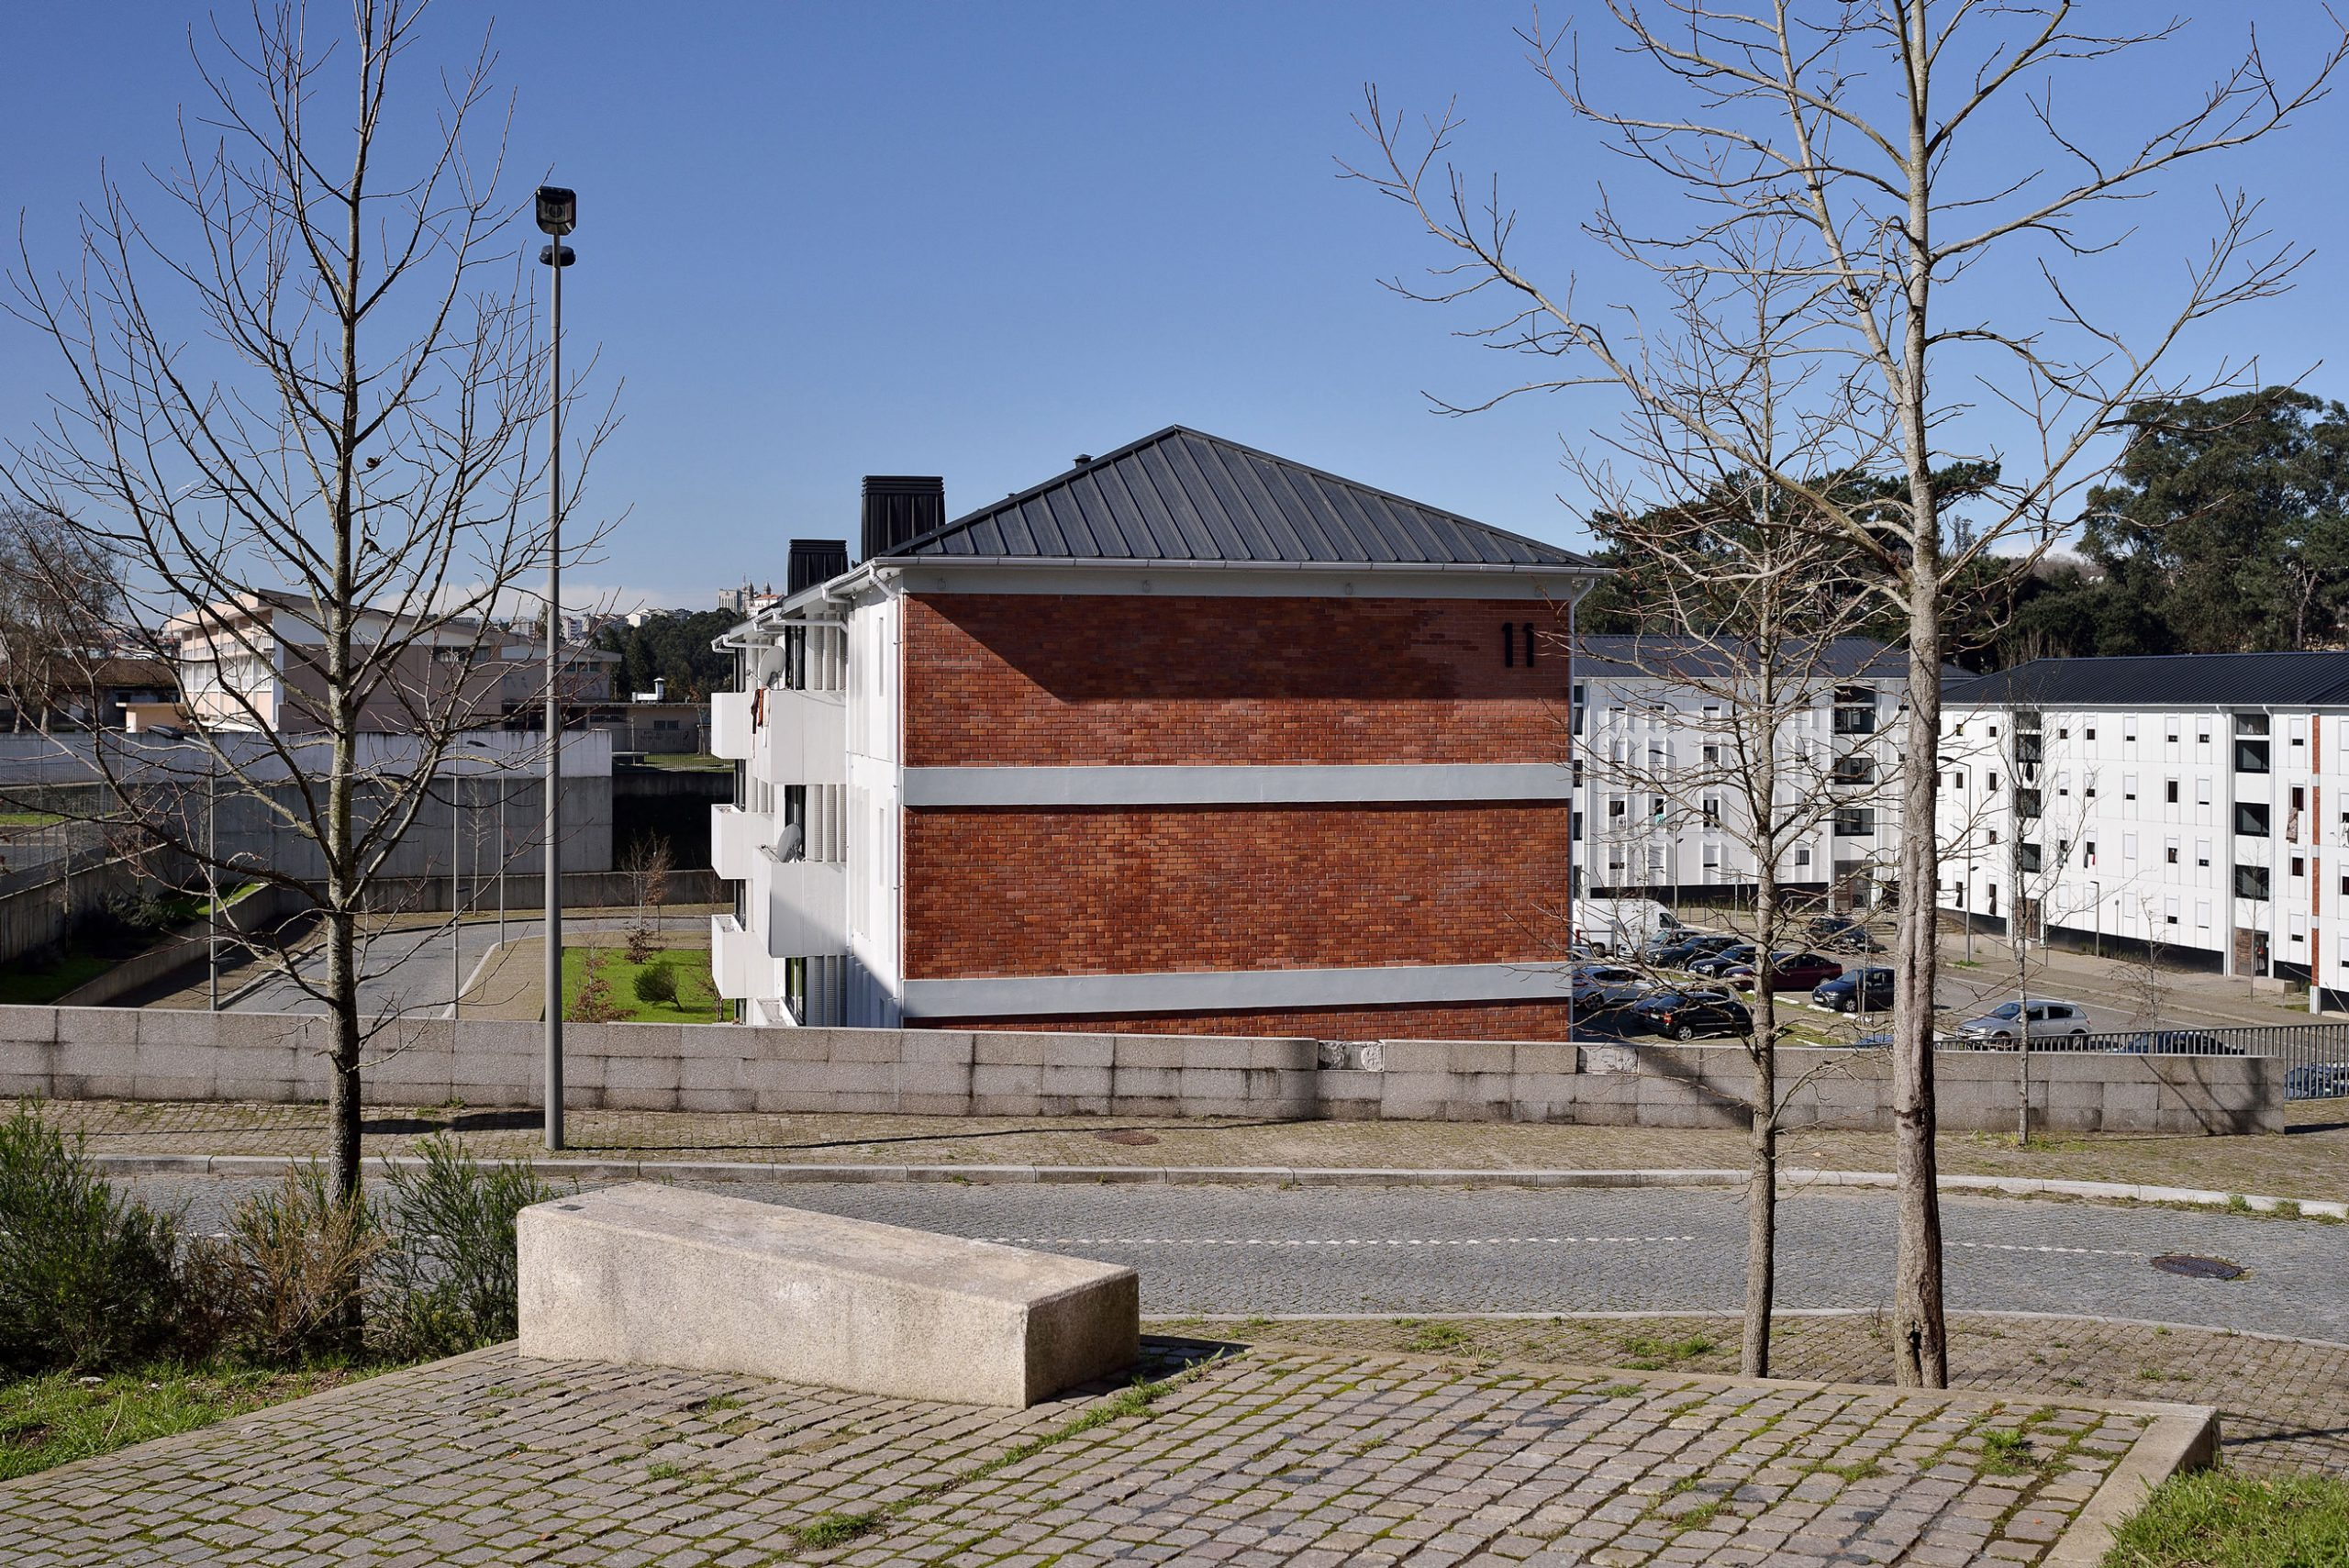 Building Renovations in Lagarteiro Neighborhood, Porto